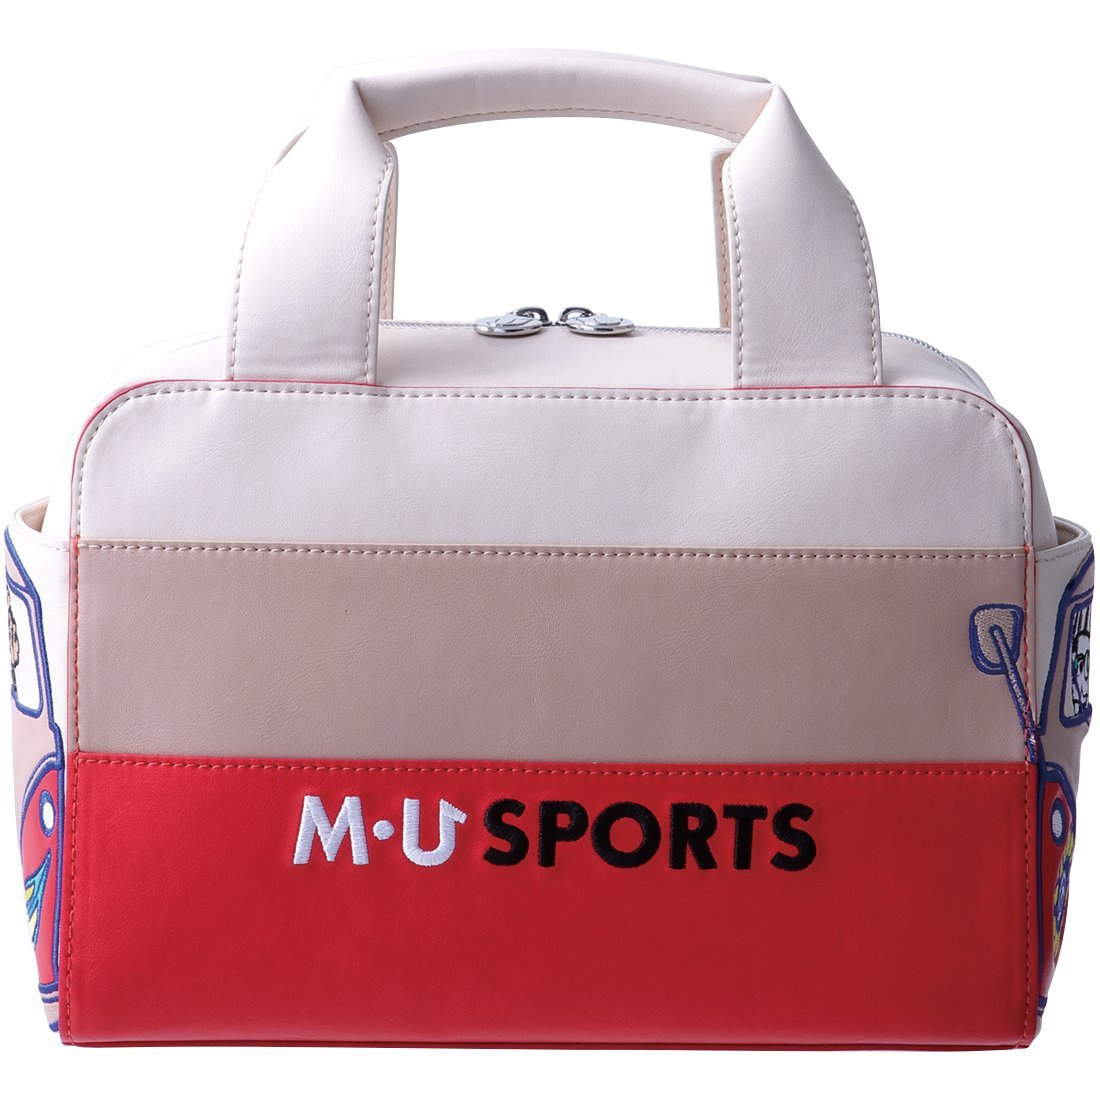 MU Sportsレディースtop-handleポーチバッグ、703 V2004 B07DWGLT7B ベージュ